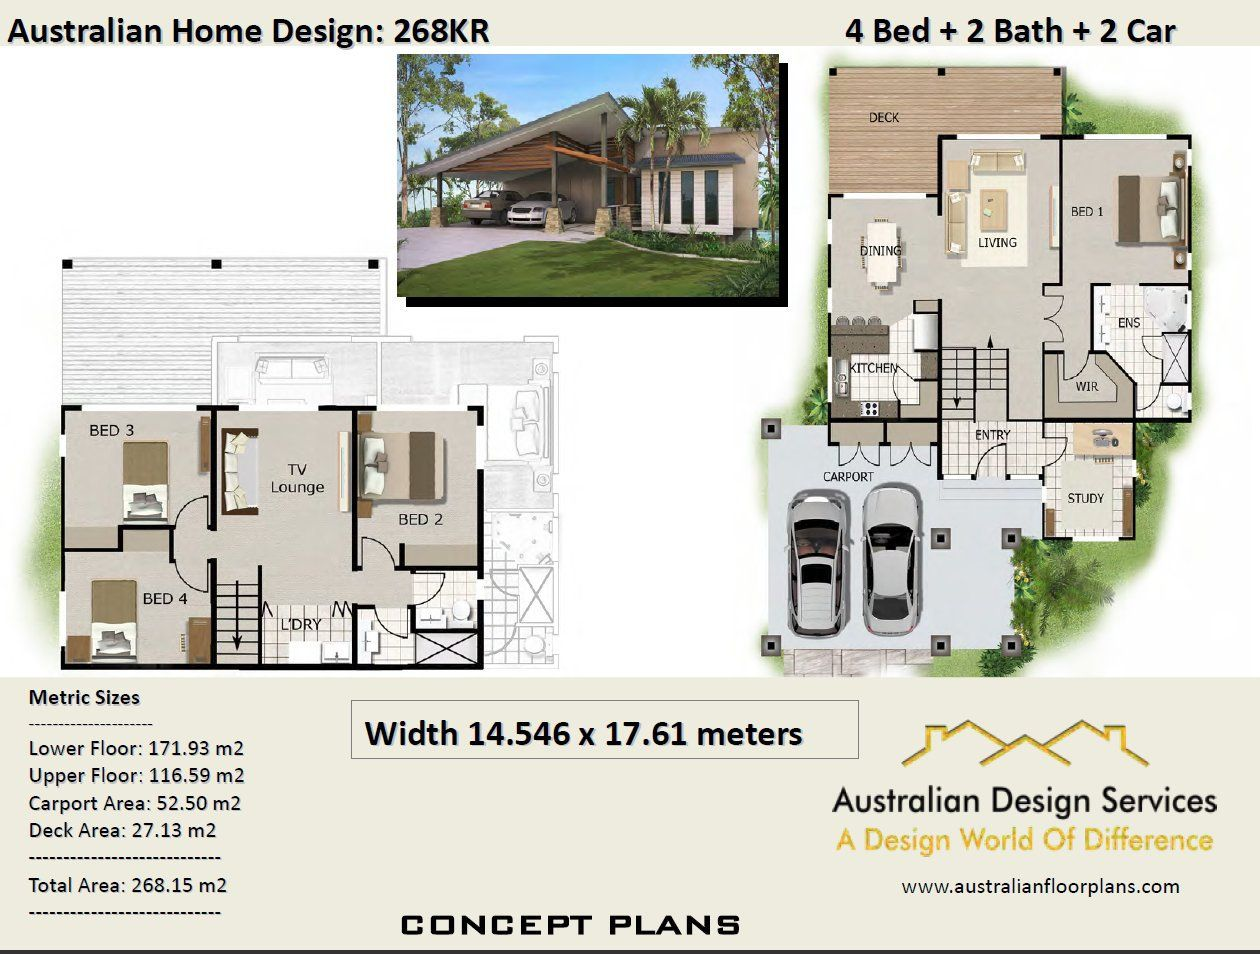 268m2 4 Bedrooms 4 Bedrooms Split Level Floor Plan 4 Bedroom Carport Plans Modern 4 Bed Porch House Plans Floor Plan 4 Bedroom House Plans Australia